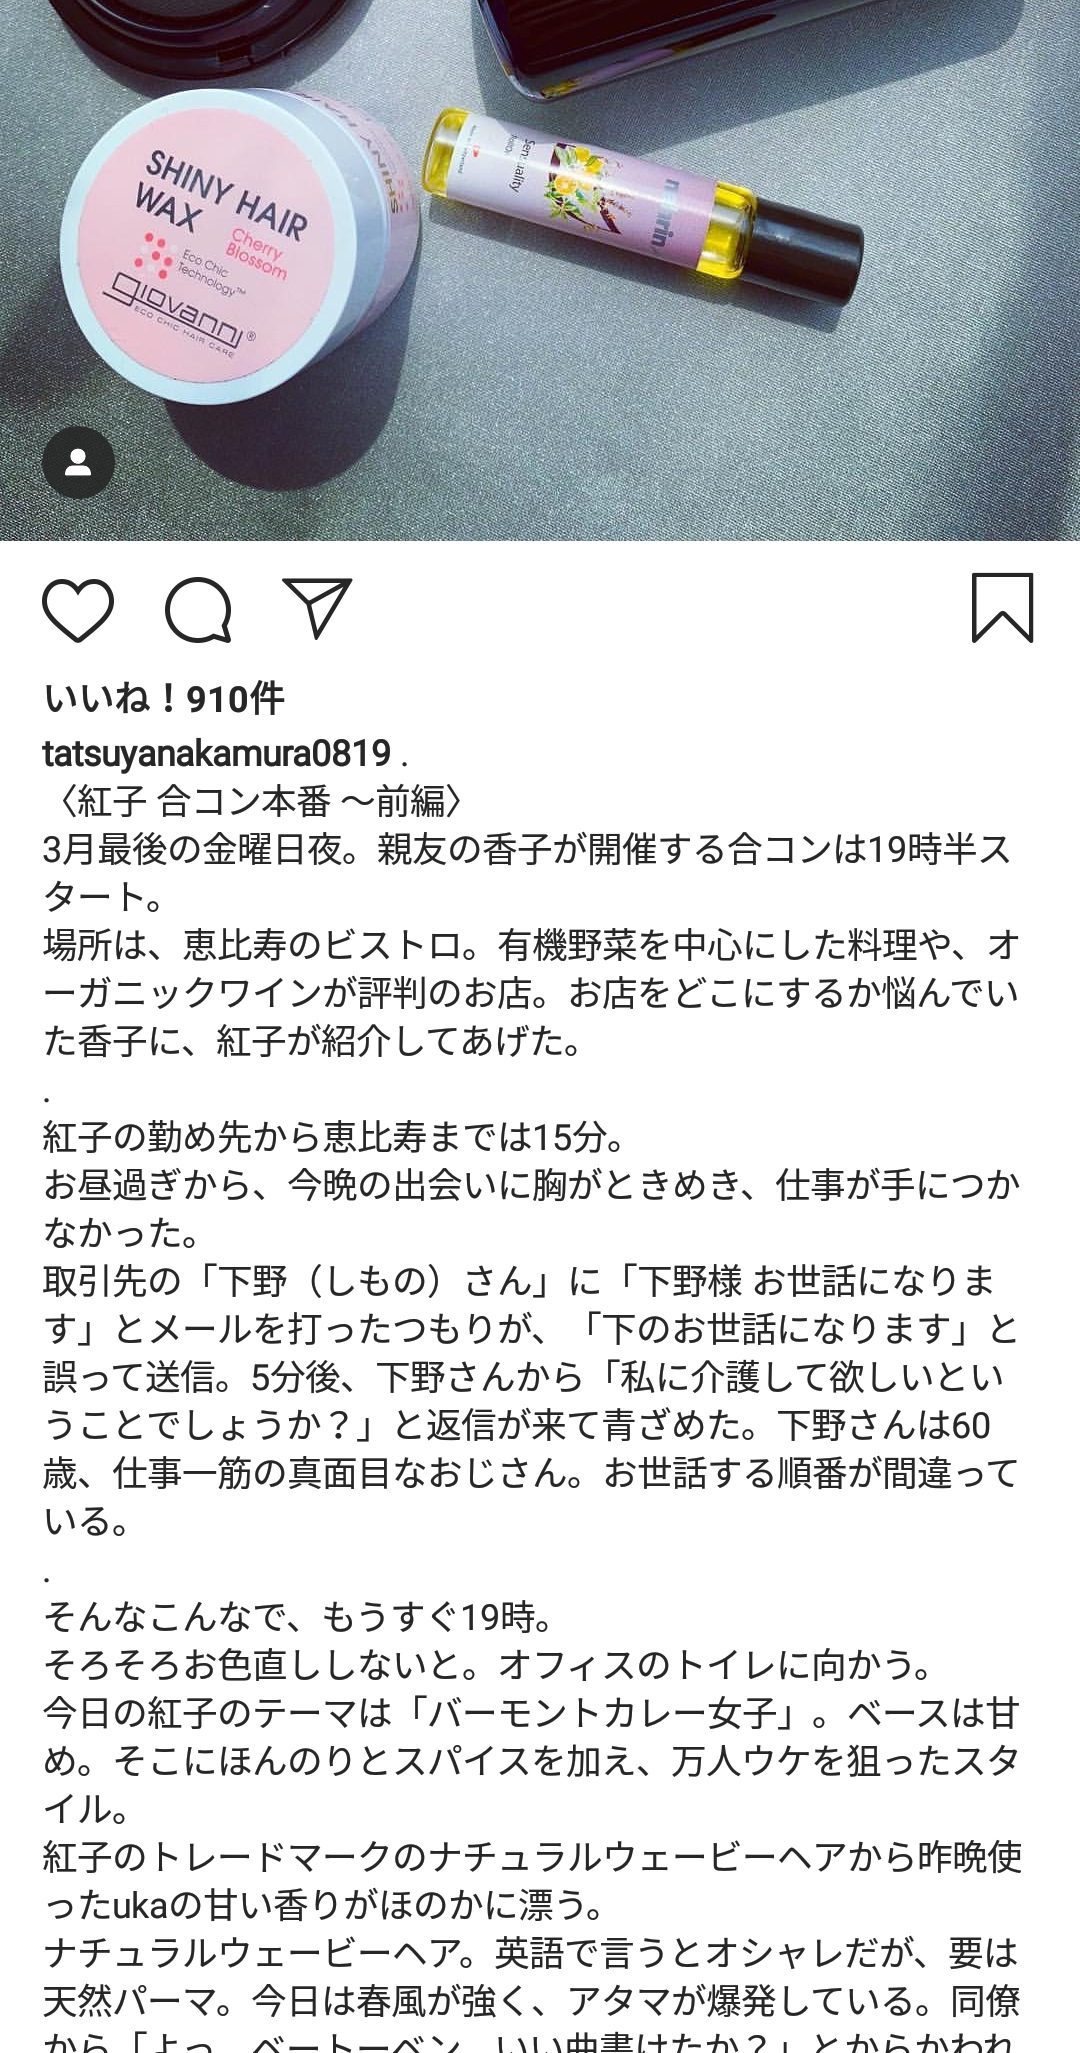 tastuya nakamuraさんの妄想記はフォロワーを魅了。